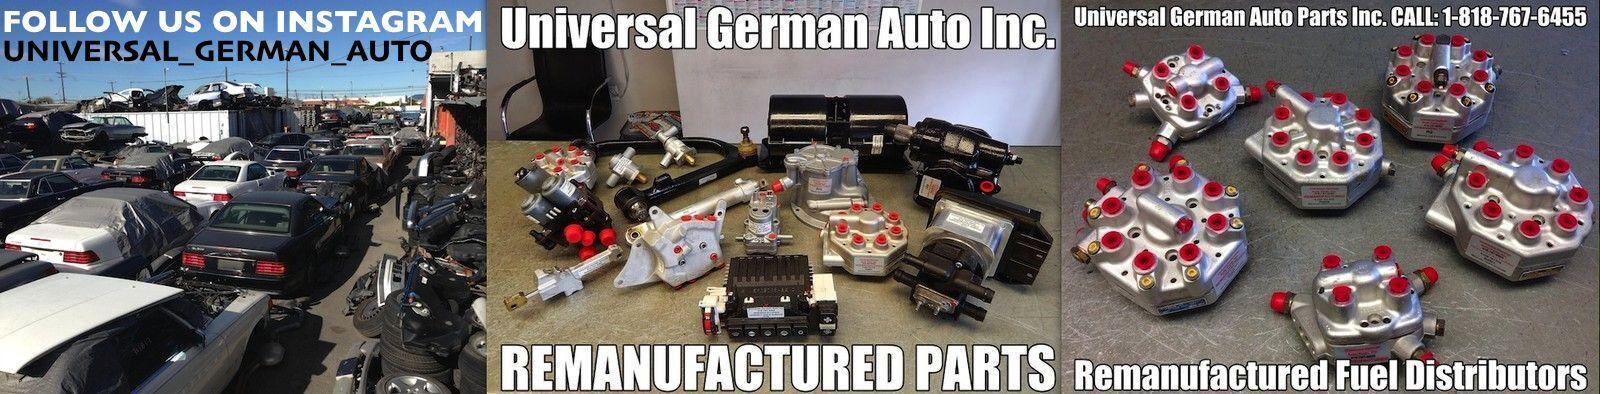 Universal German Auto Parts Inc.